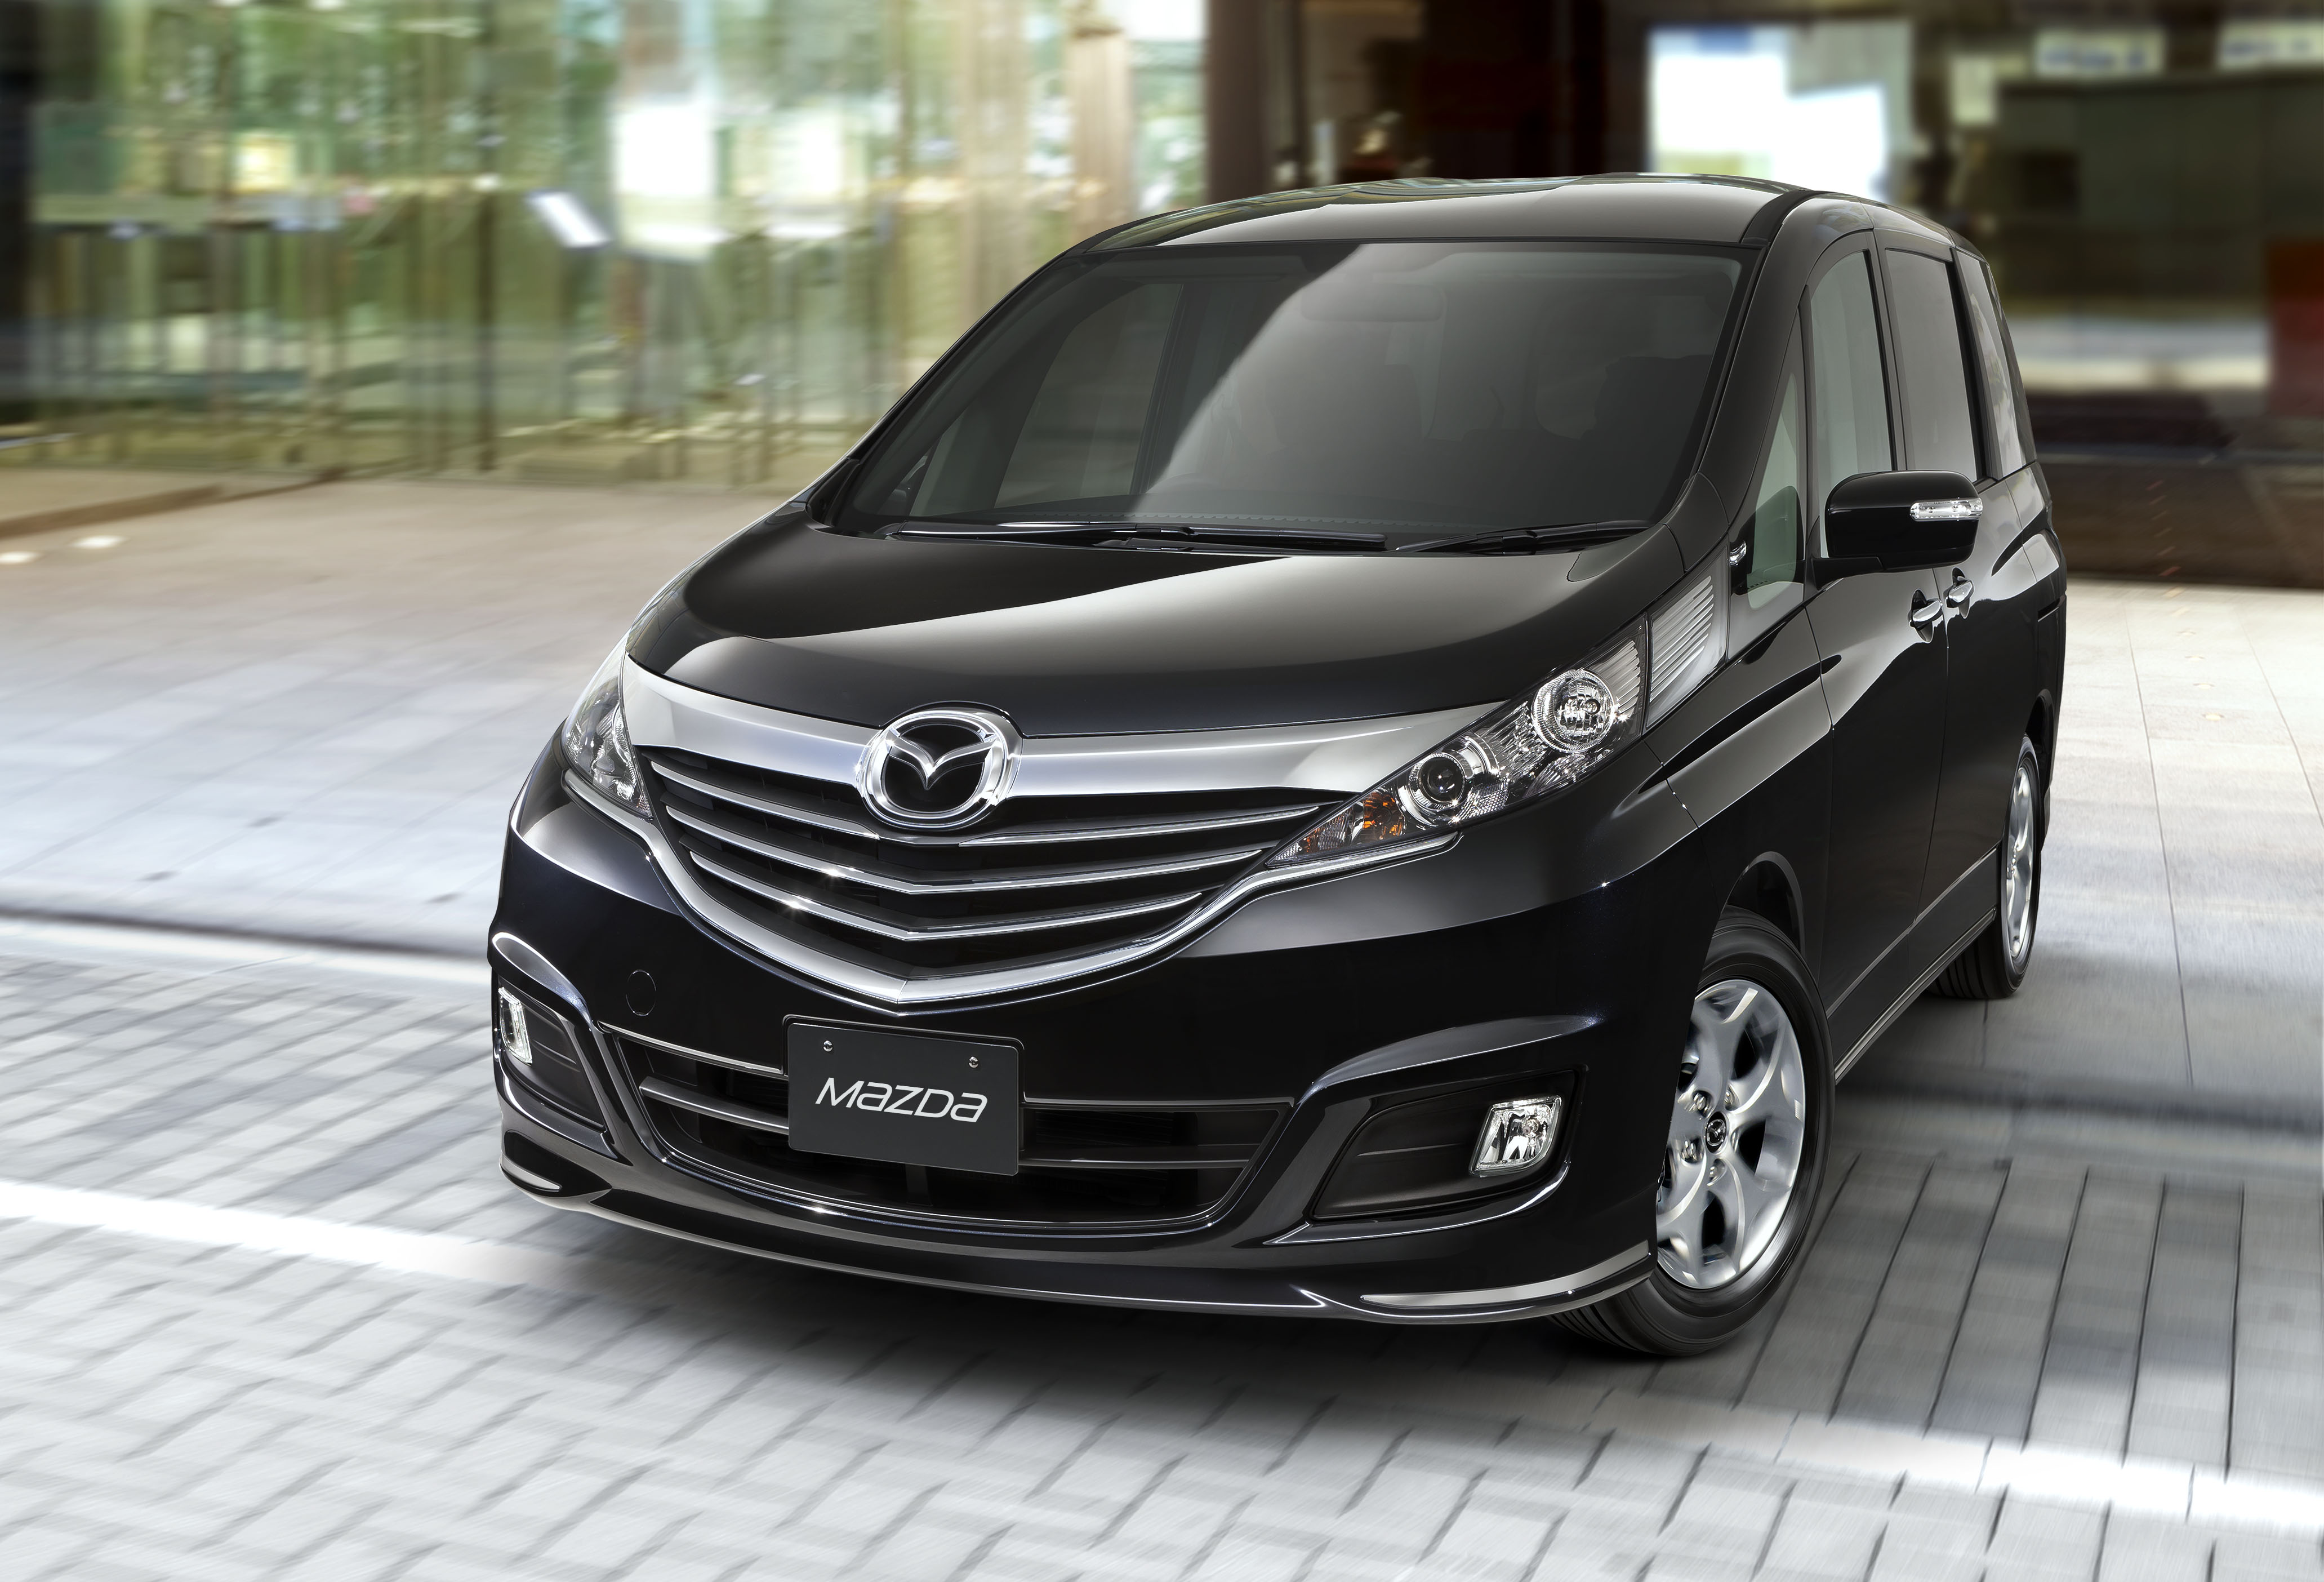 What Is Skyactiv Mazda >> 2013 Mazda Biante launched – SkyActiv-G 2.0, RM146k Image 209421